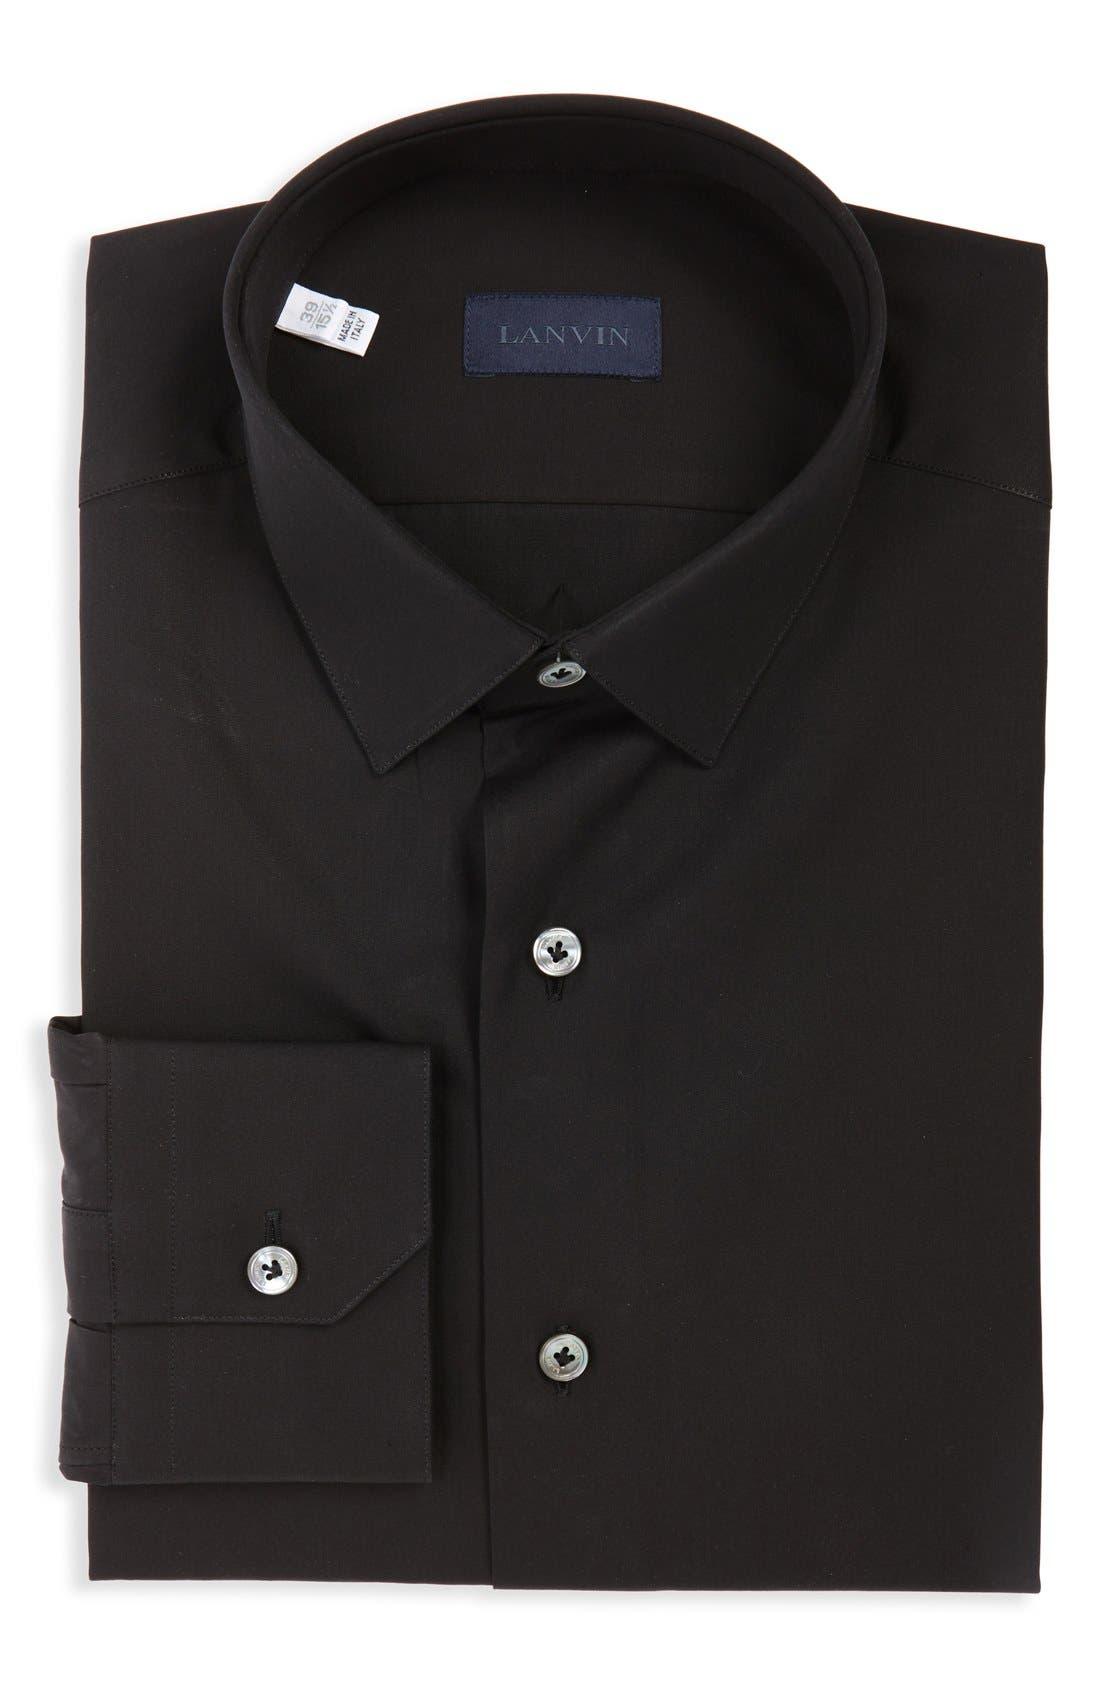 LANVIN Extra Trim Cotton Poplin Sport Shirt